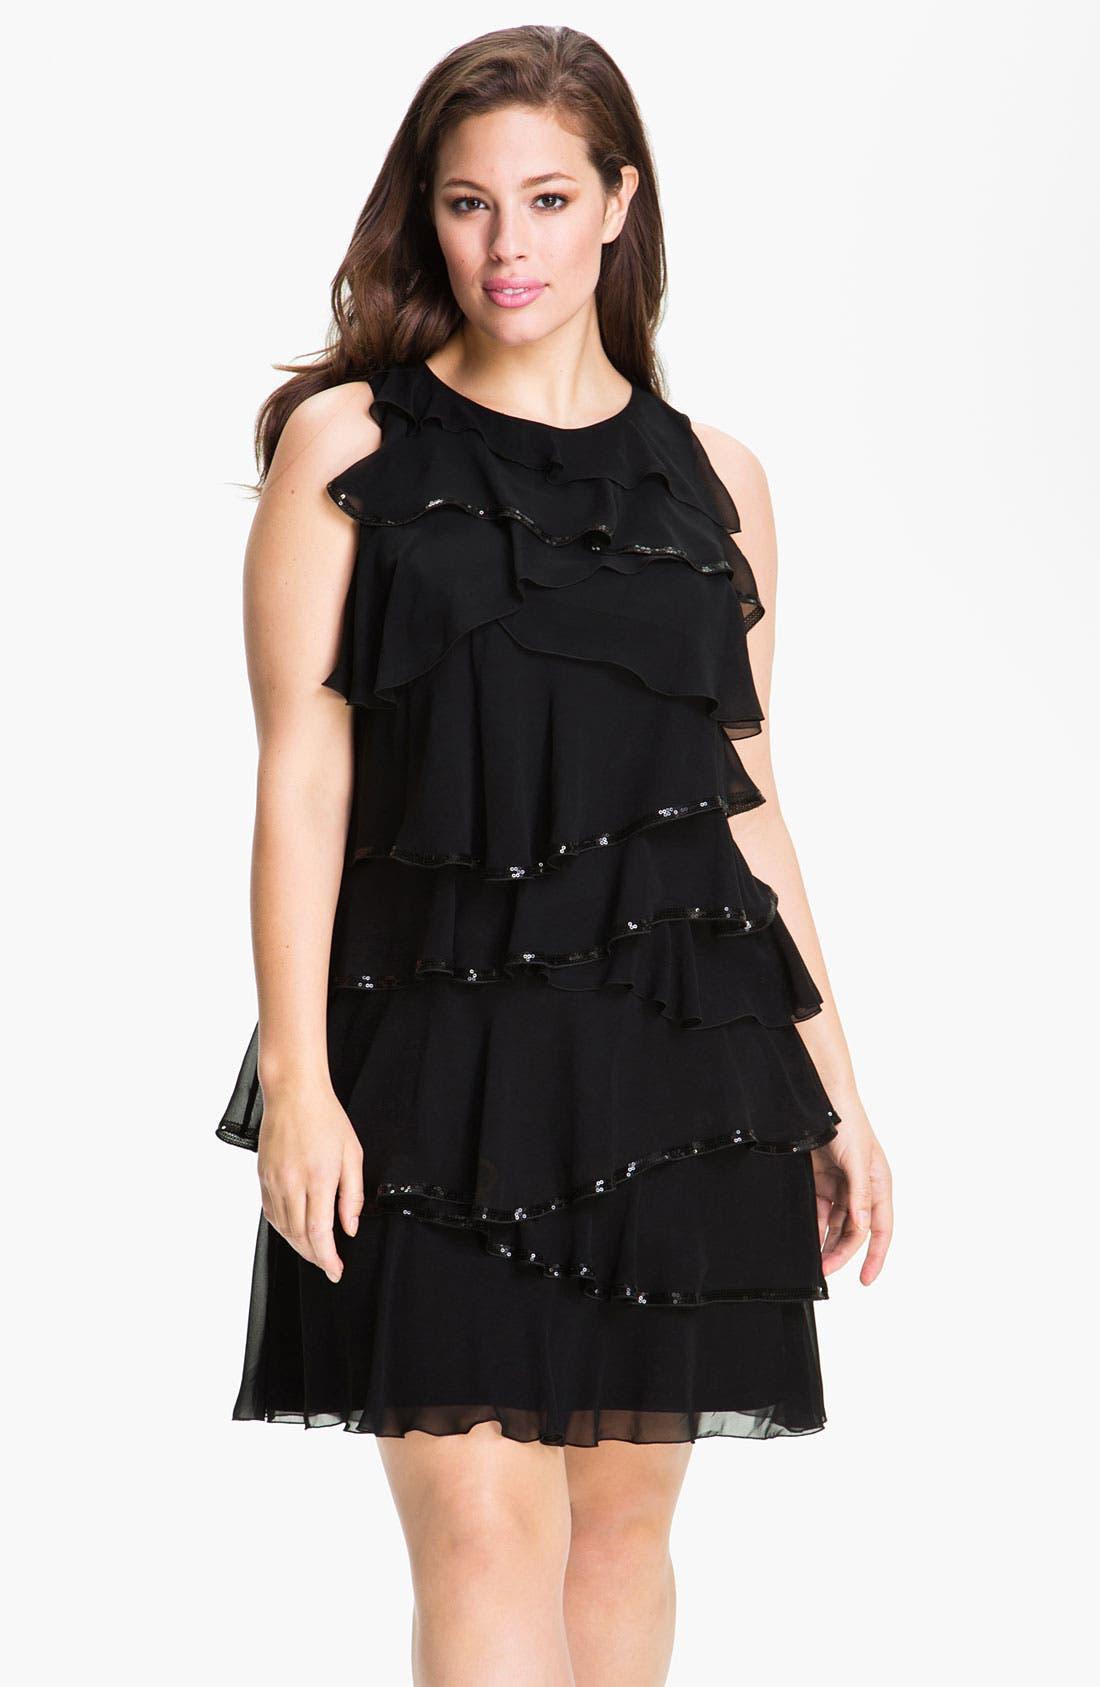 Alternate Image 1 Selected - Calvin Klein Tiered Chiffon Shift Dress (Plus)